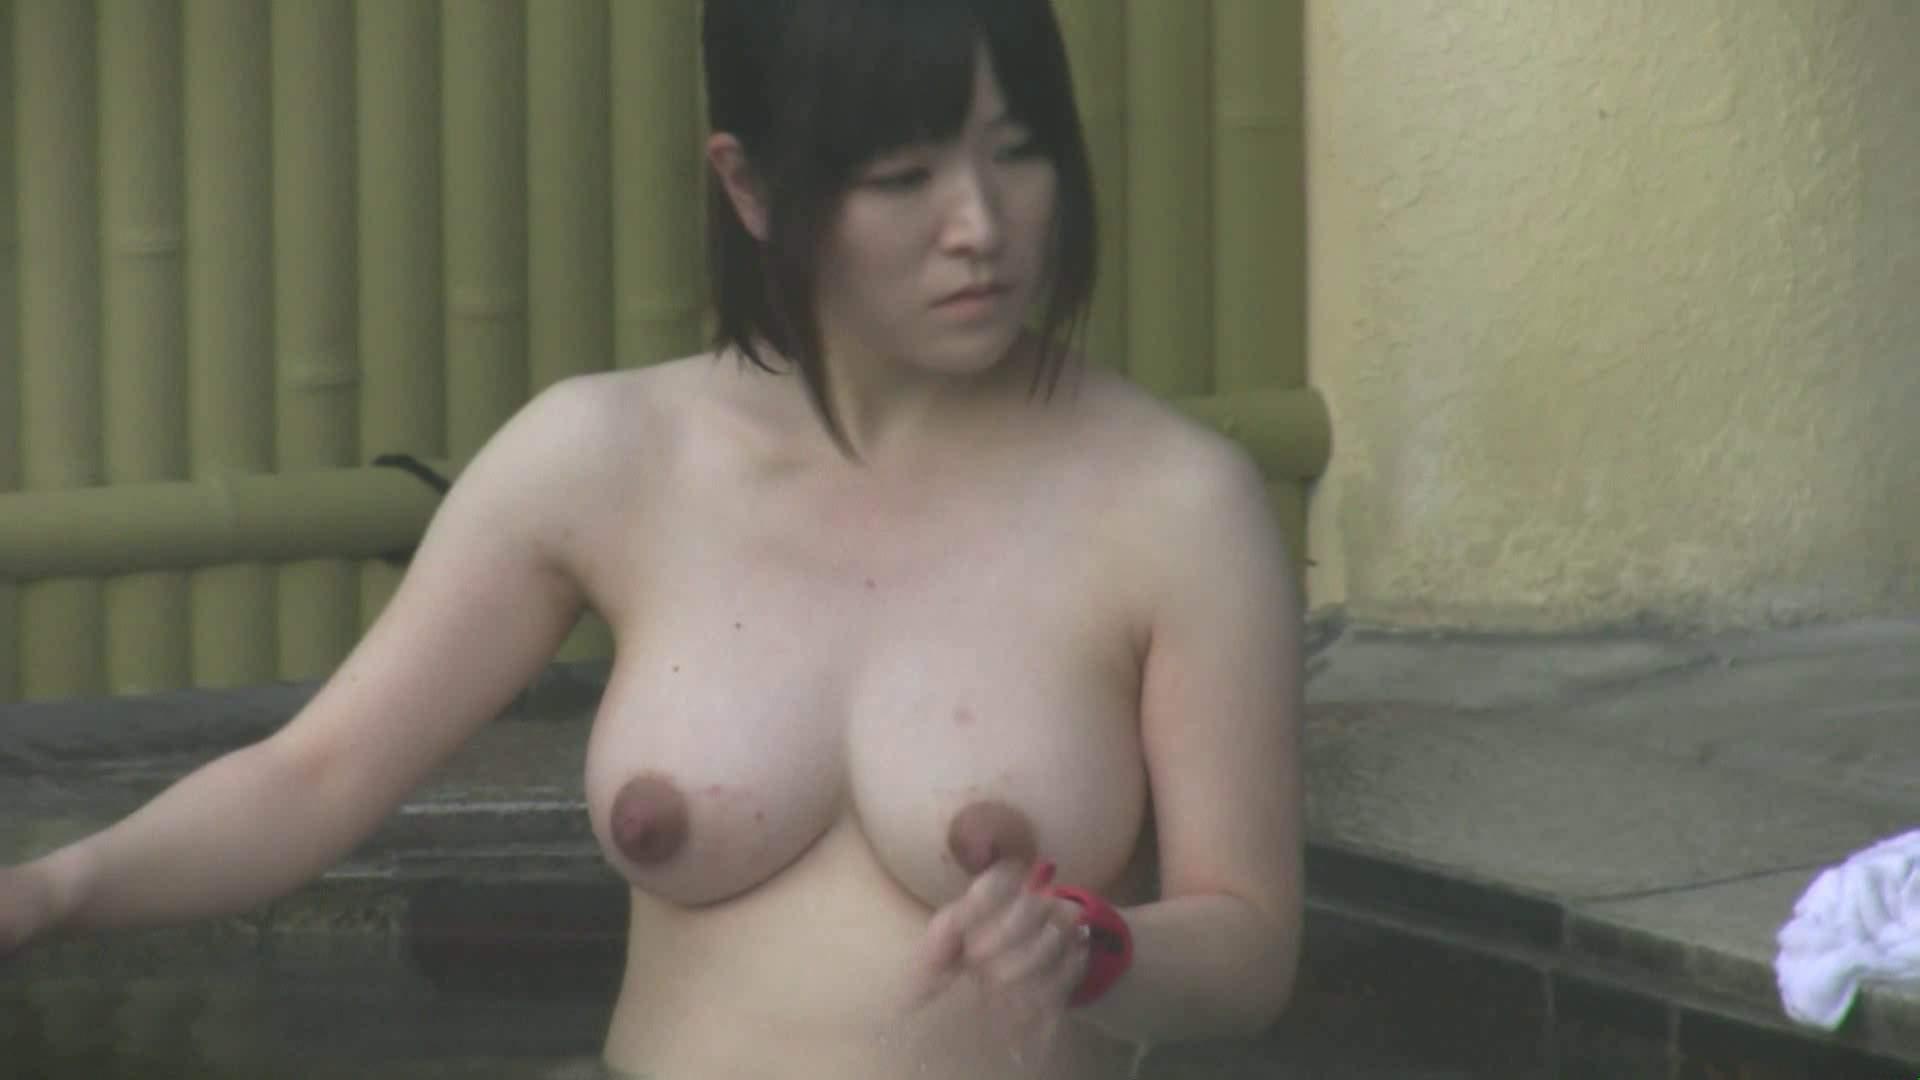 Aquaな露天風呂Vol.606 OLのエロ生活 性交動画流出 25連発 17